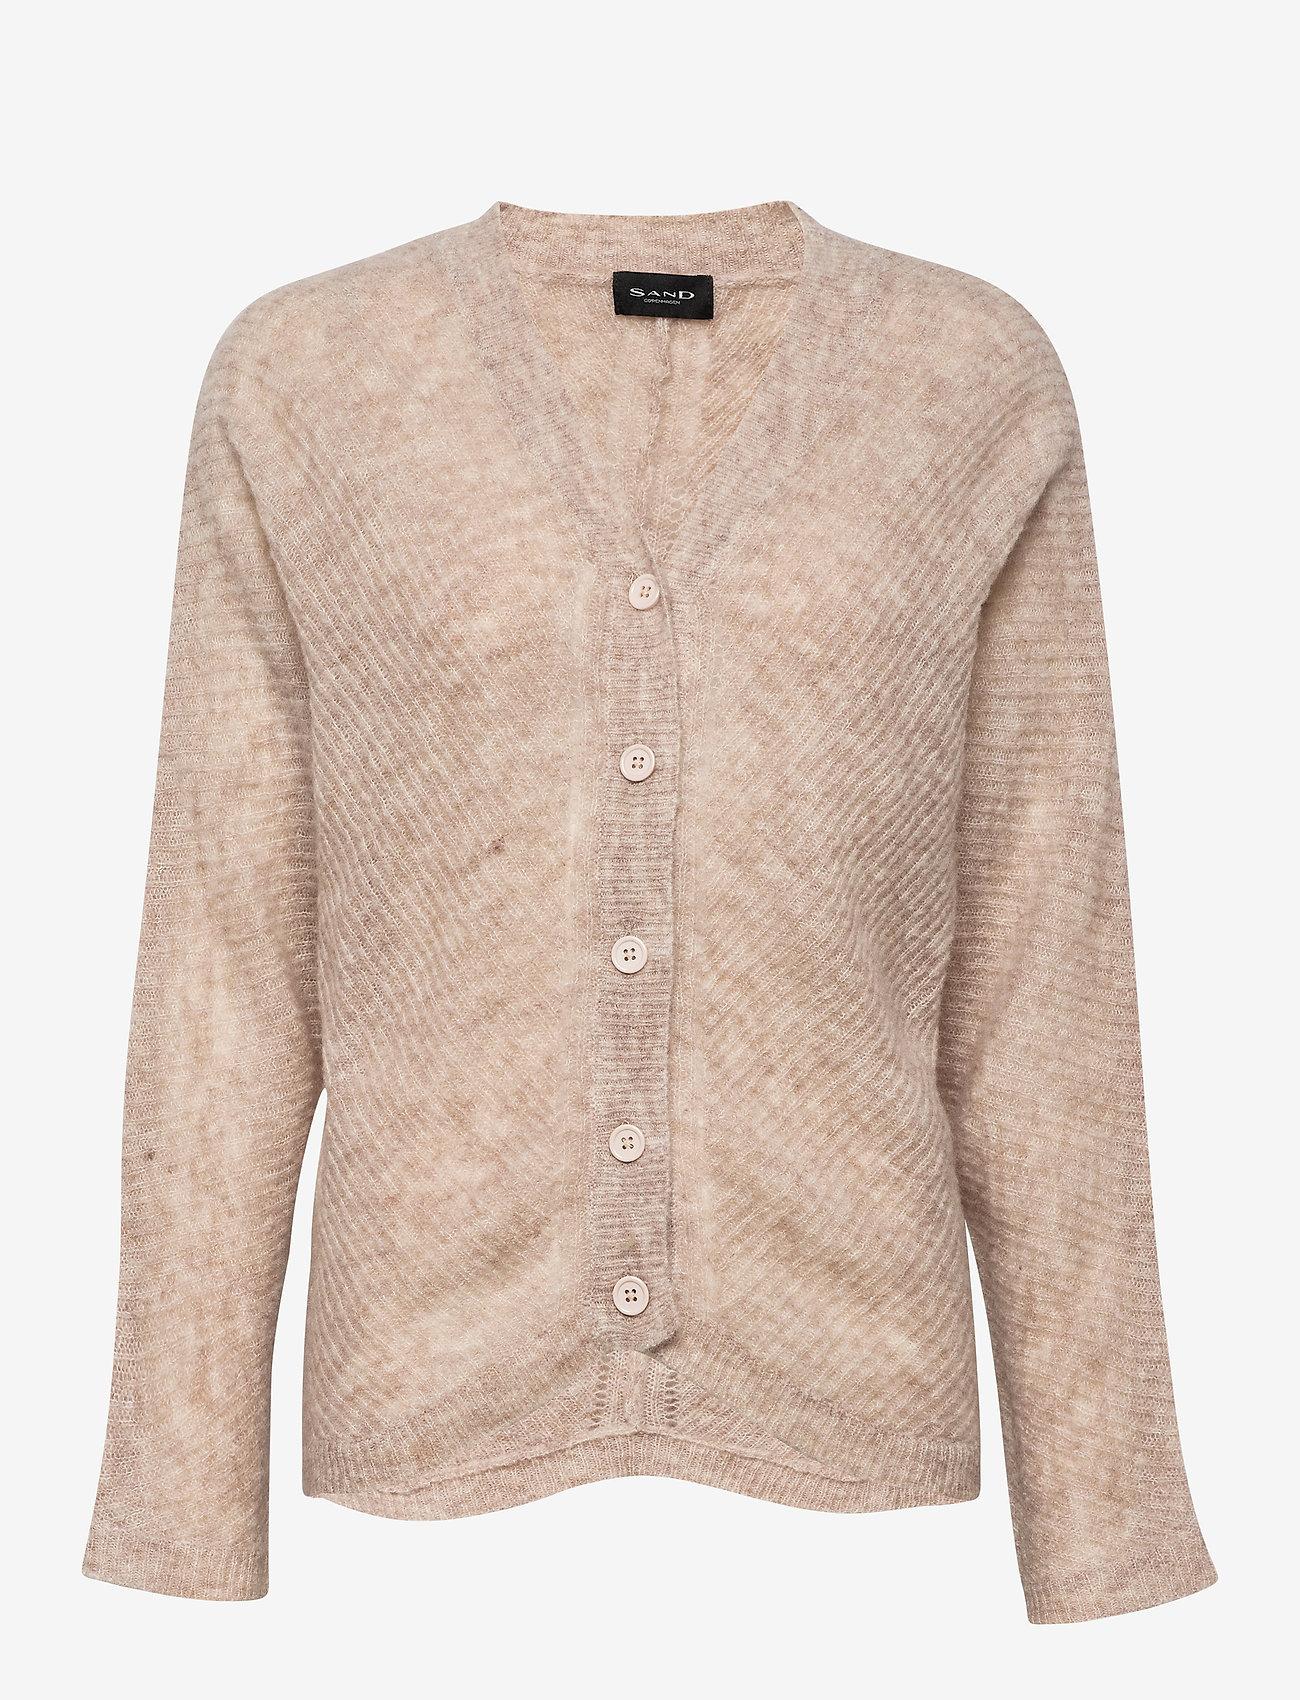 SAND - 5194 - Silje Cardigan - cardigans - light beige - 0